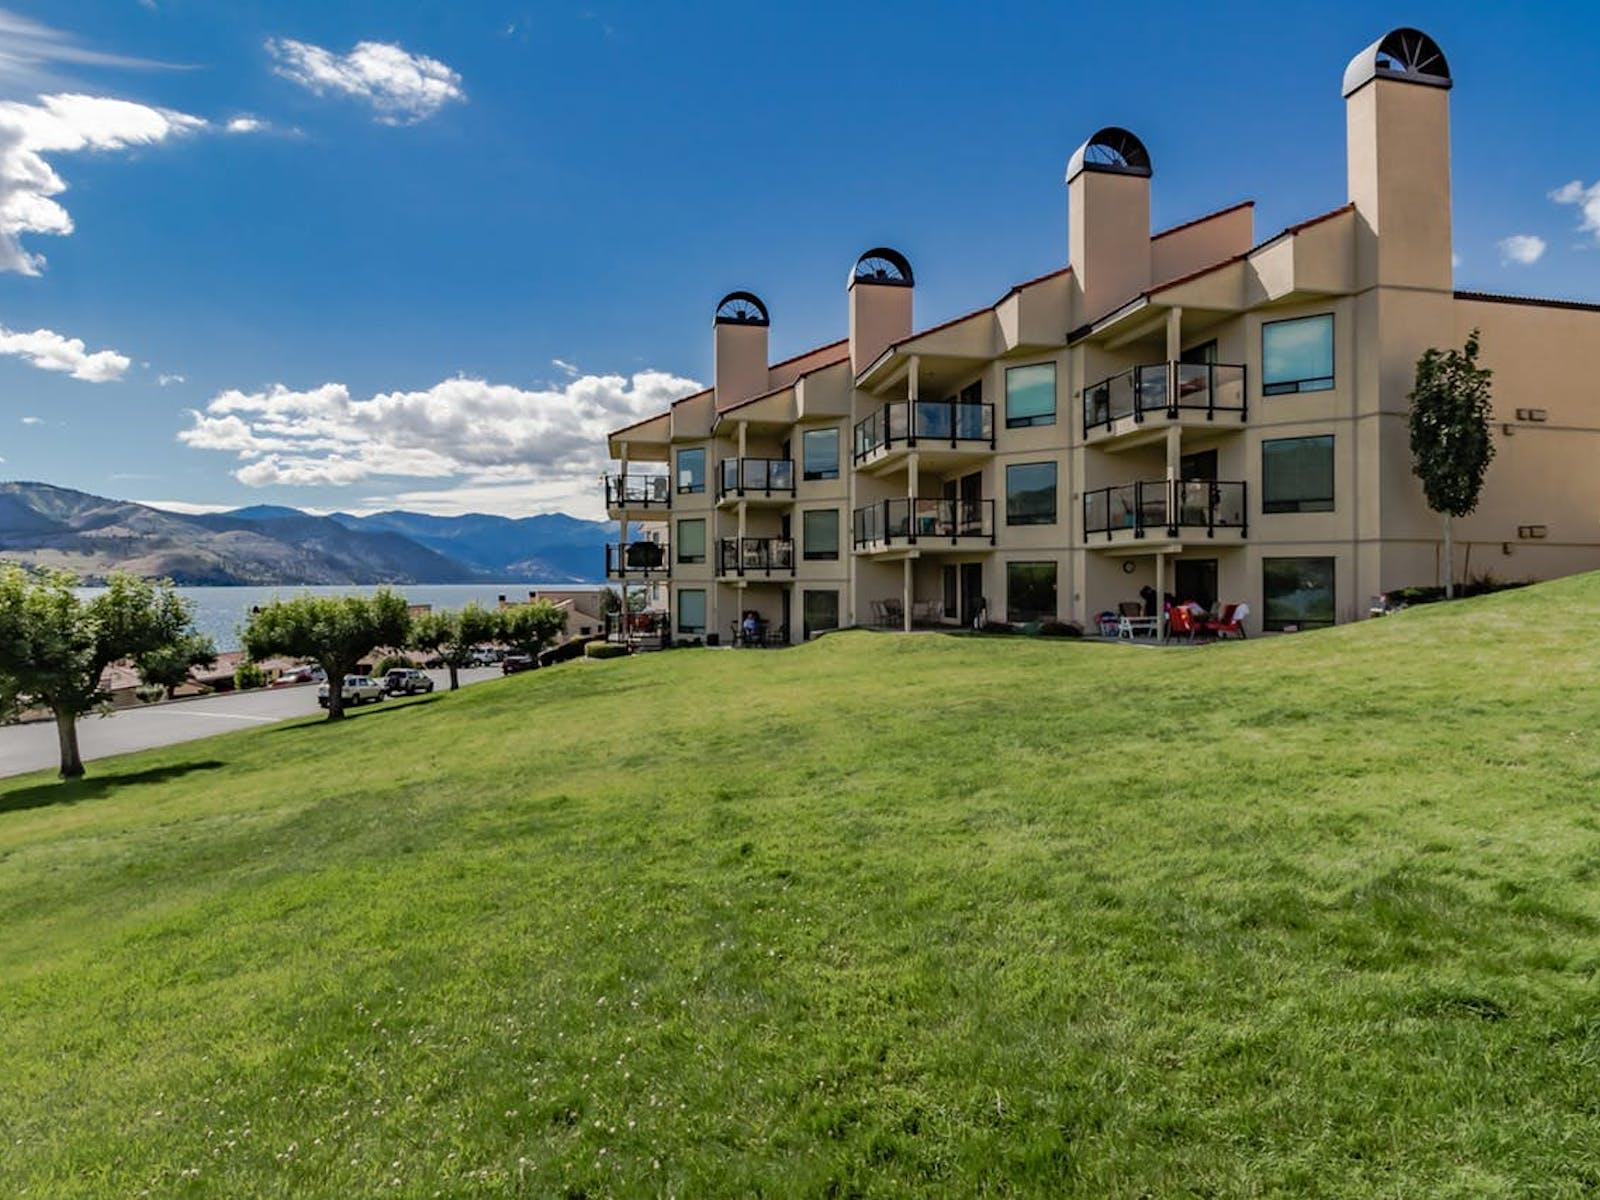 Chelan Shores vacation rentals with beautiful views of the lake